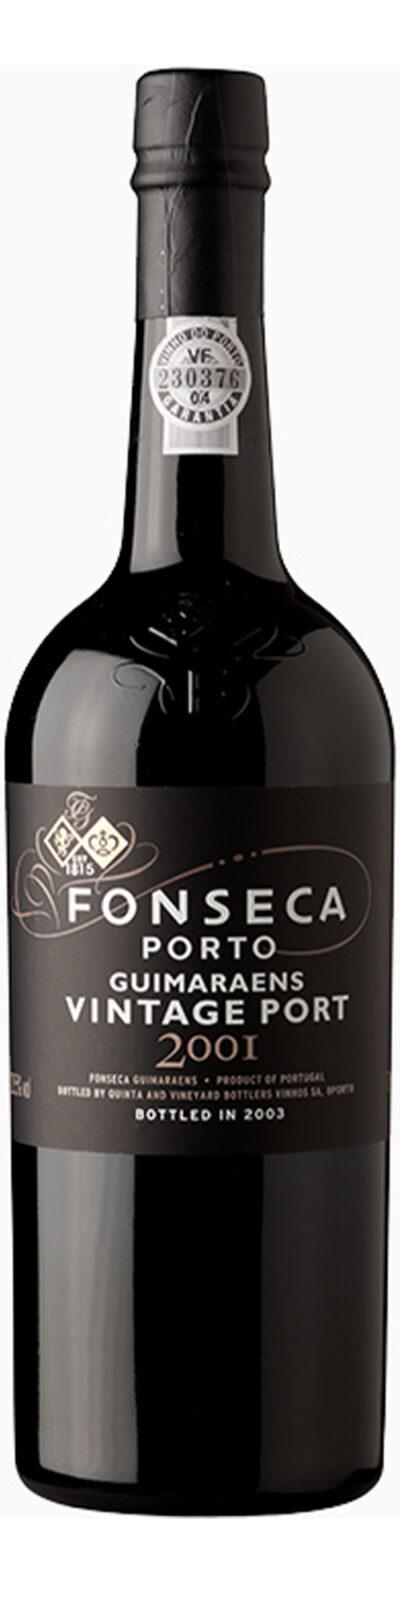 Fonseca Guimaraens Vintage Port